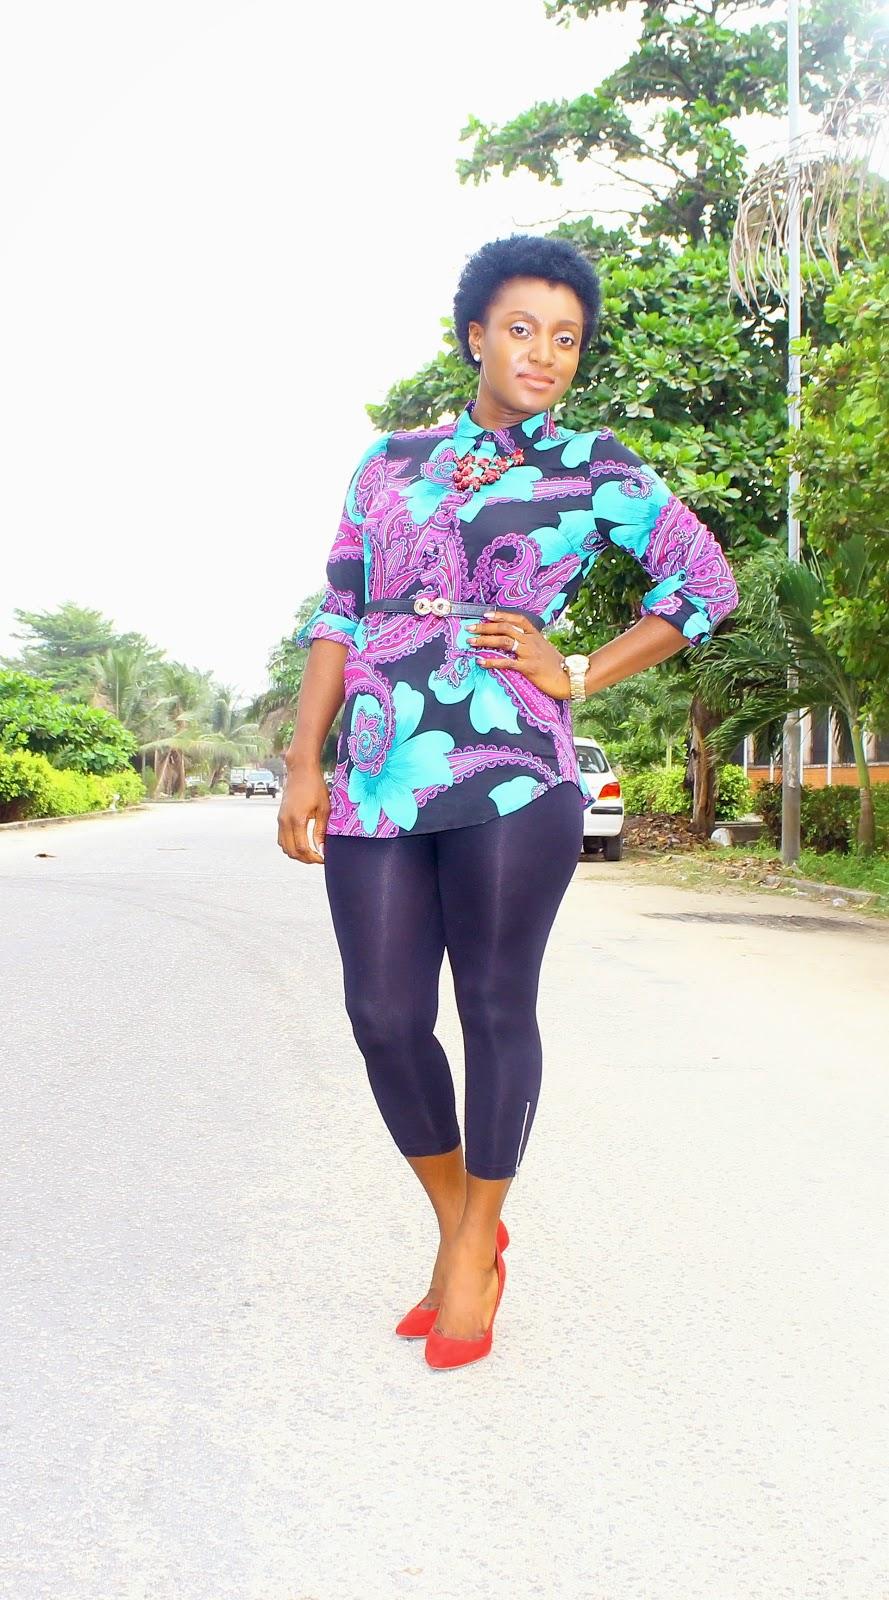 Buy Quality Clothing